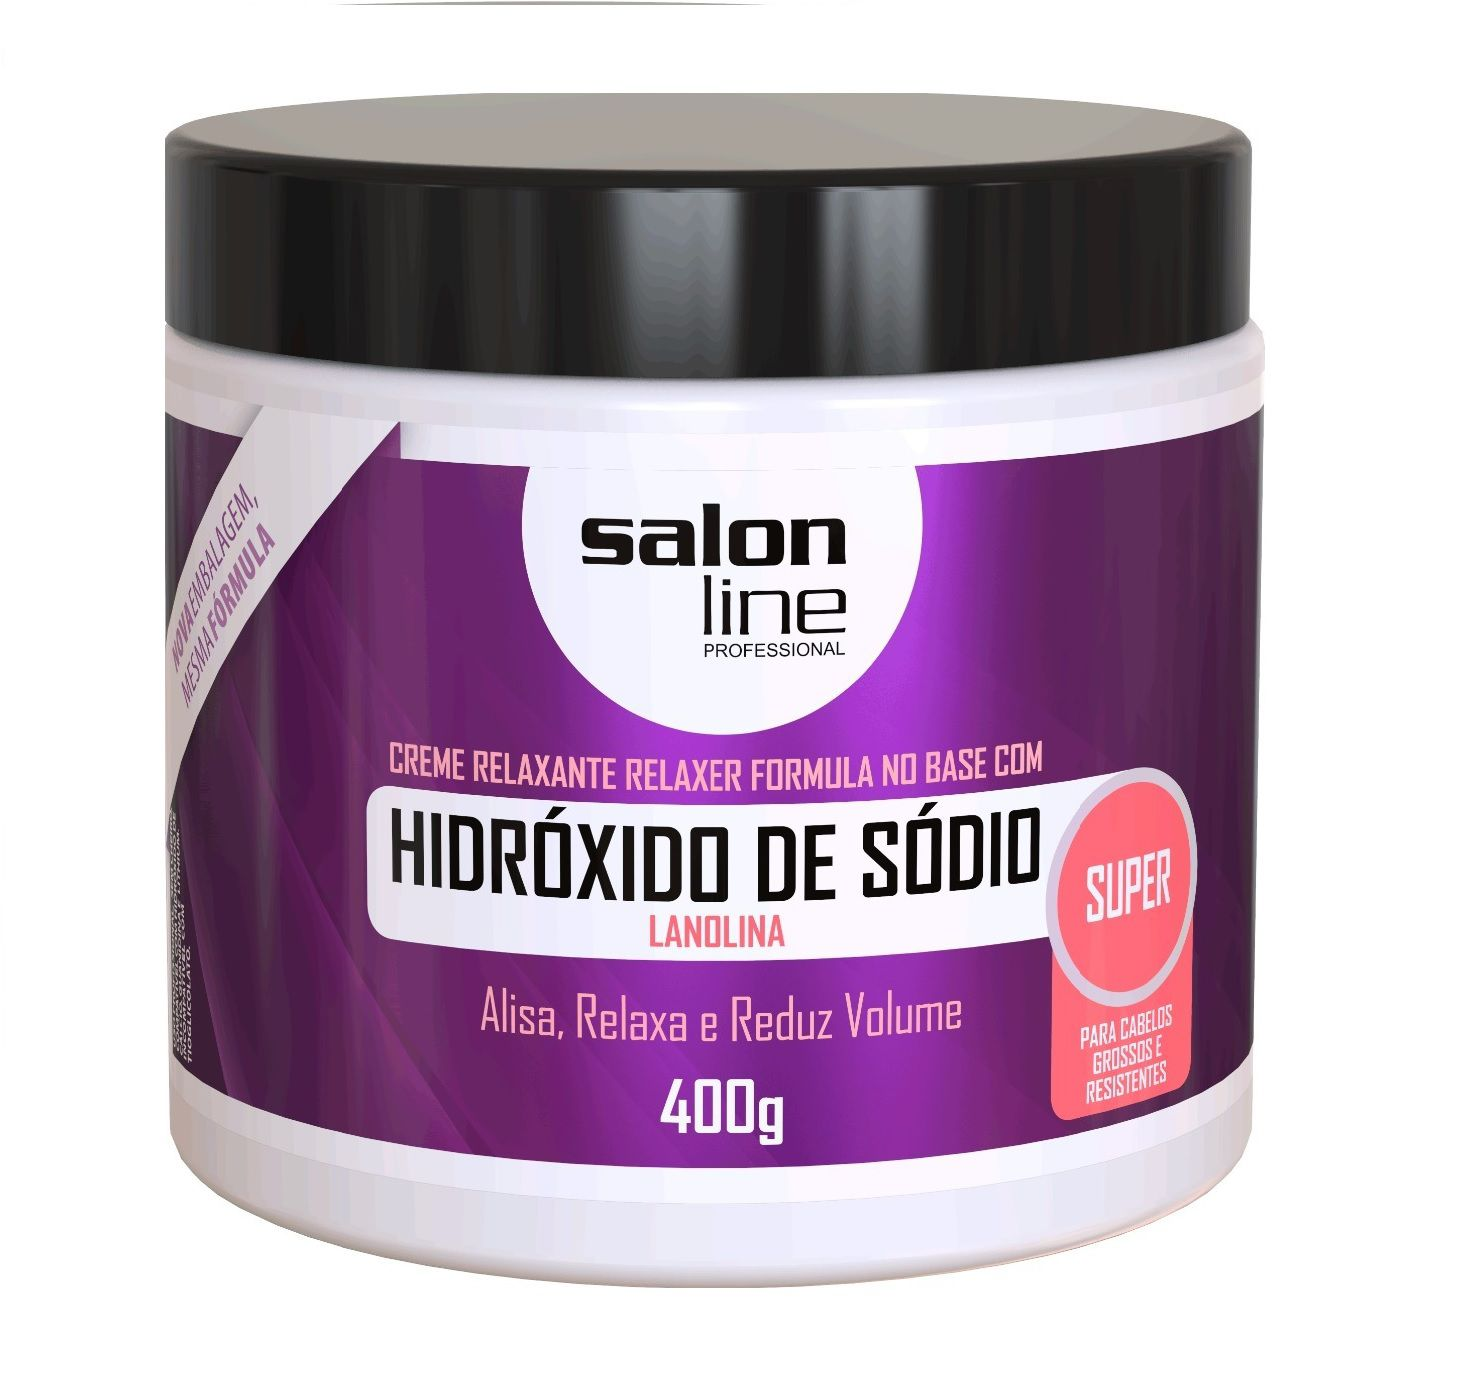 Creme Relaxante Hidróxido De Sódio Super 400g - Salon Line